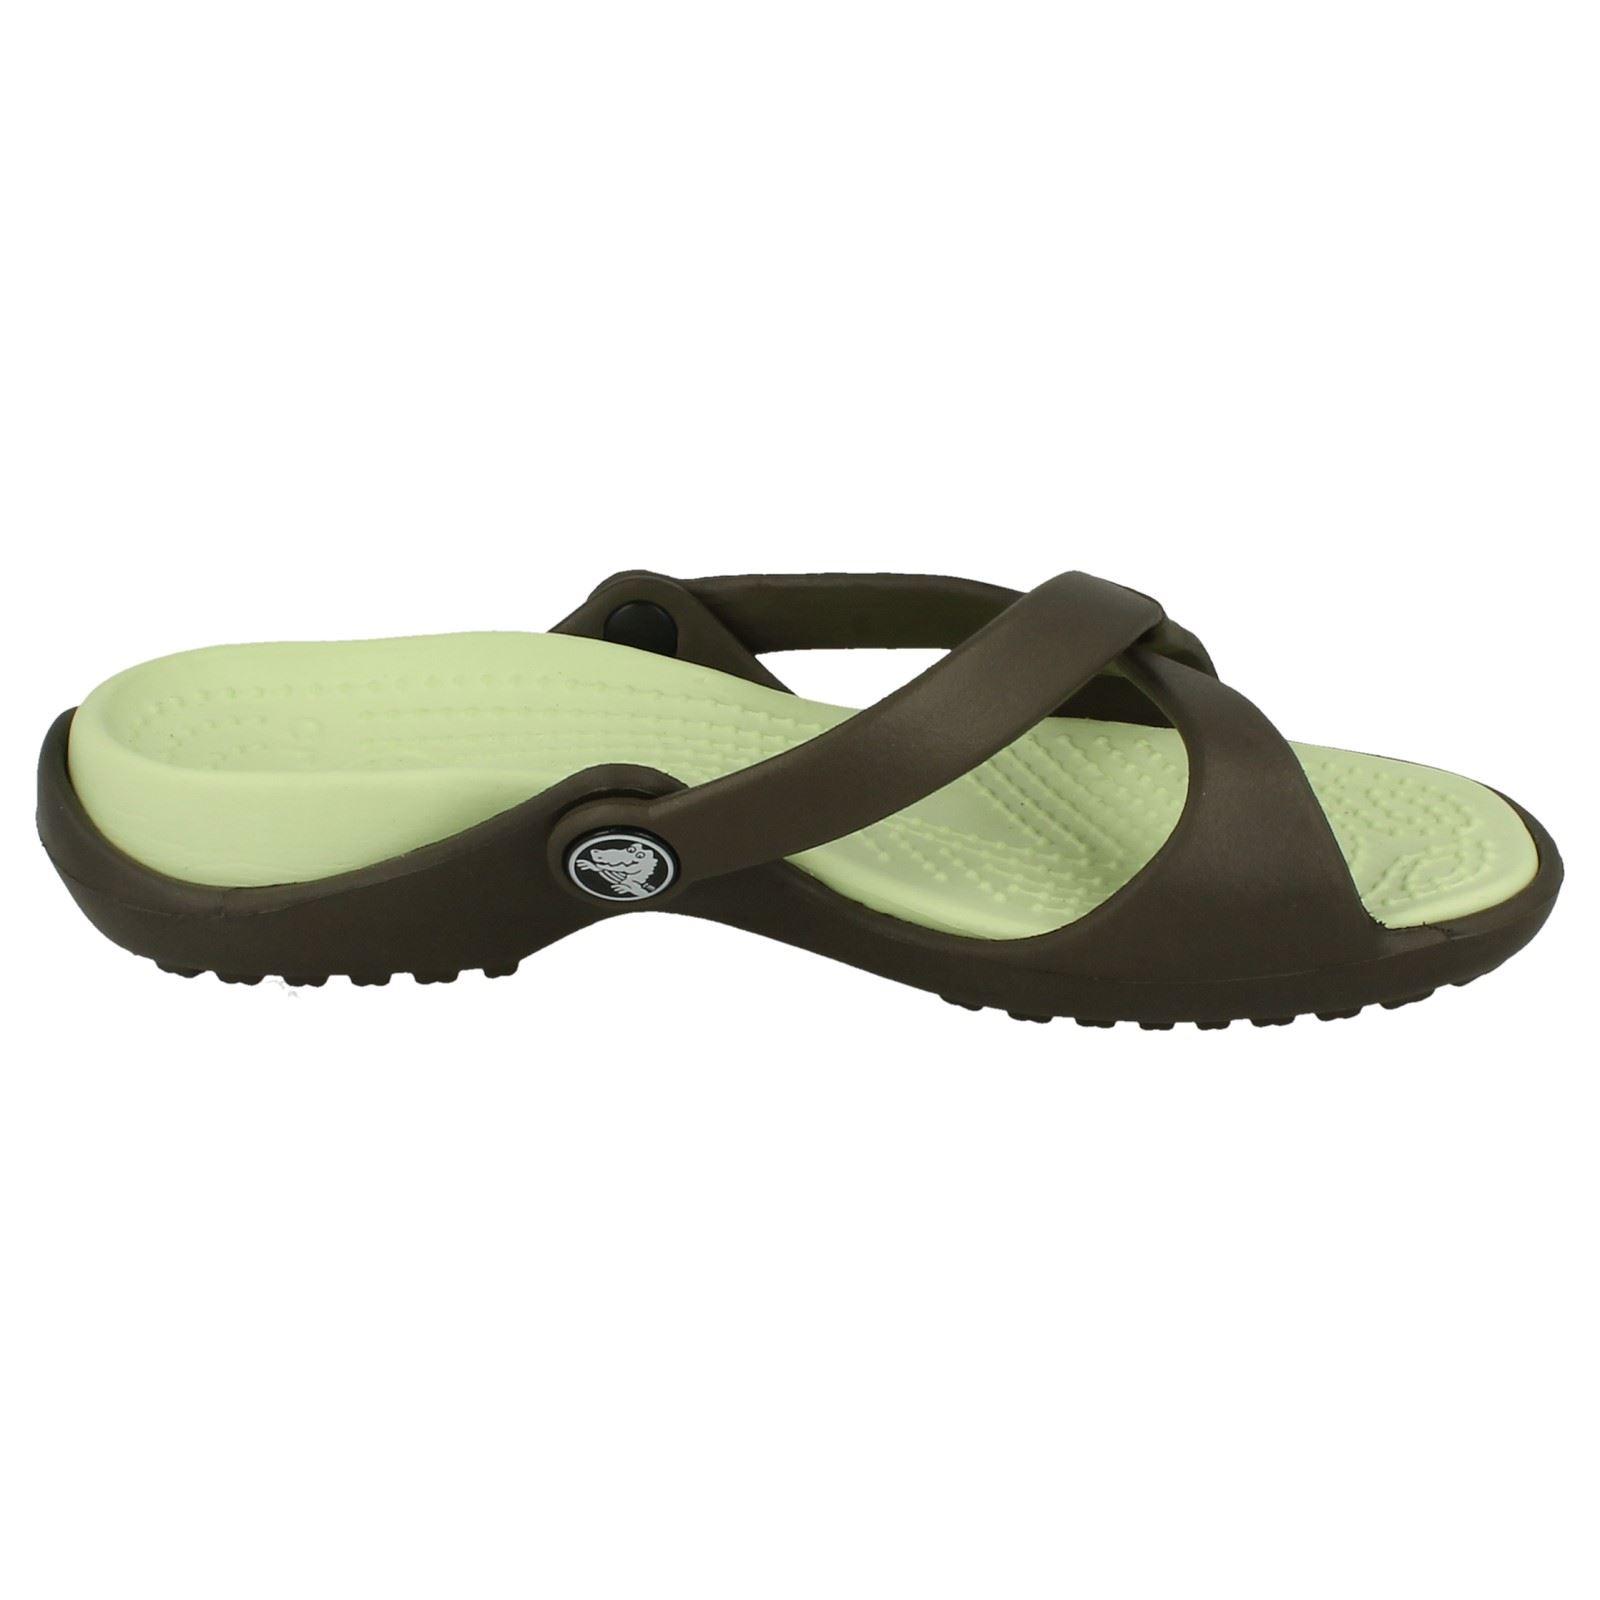 0c628e8f1 Ladies Crocs Sporty Adara Slip On Sports Sandals